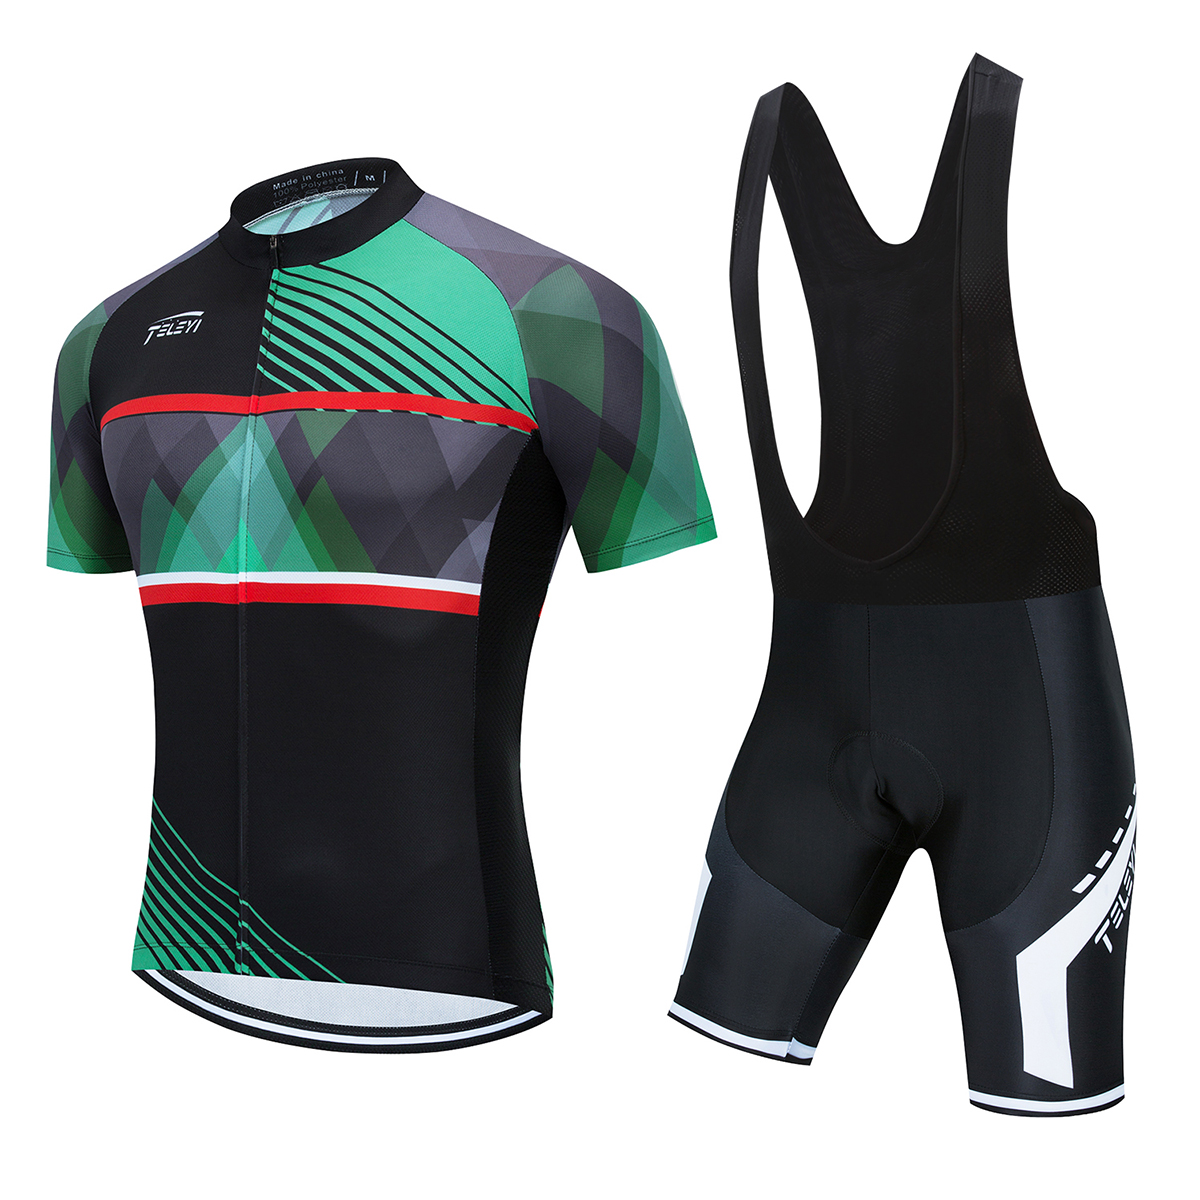 Bisiklet forması TELEYI Maillot Ropa Ciclismo Hombre takım bisiklet giyim çabuk kuru kısa kollu seti MTB bisiklet kıyafetleri 5D GLE